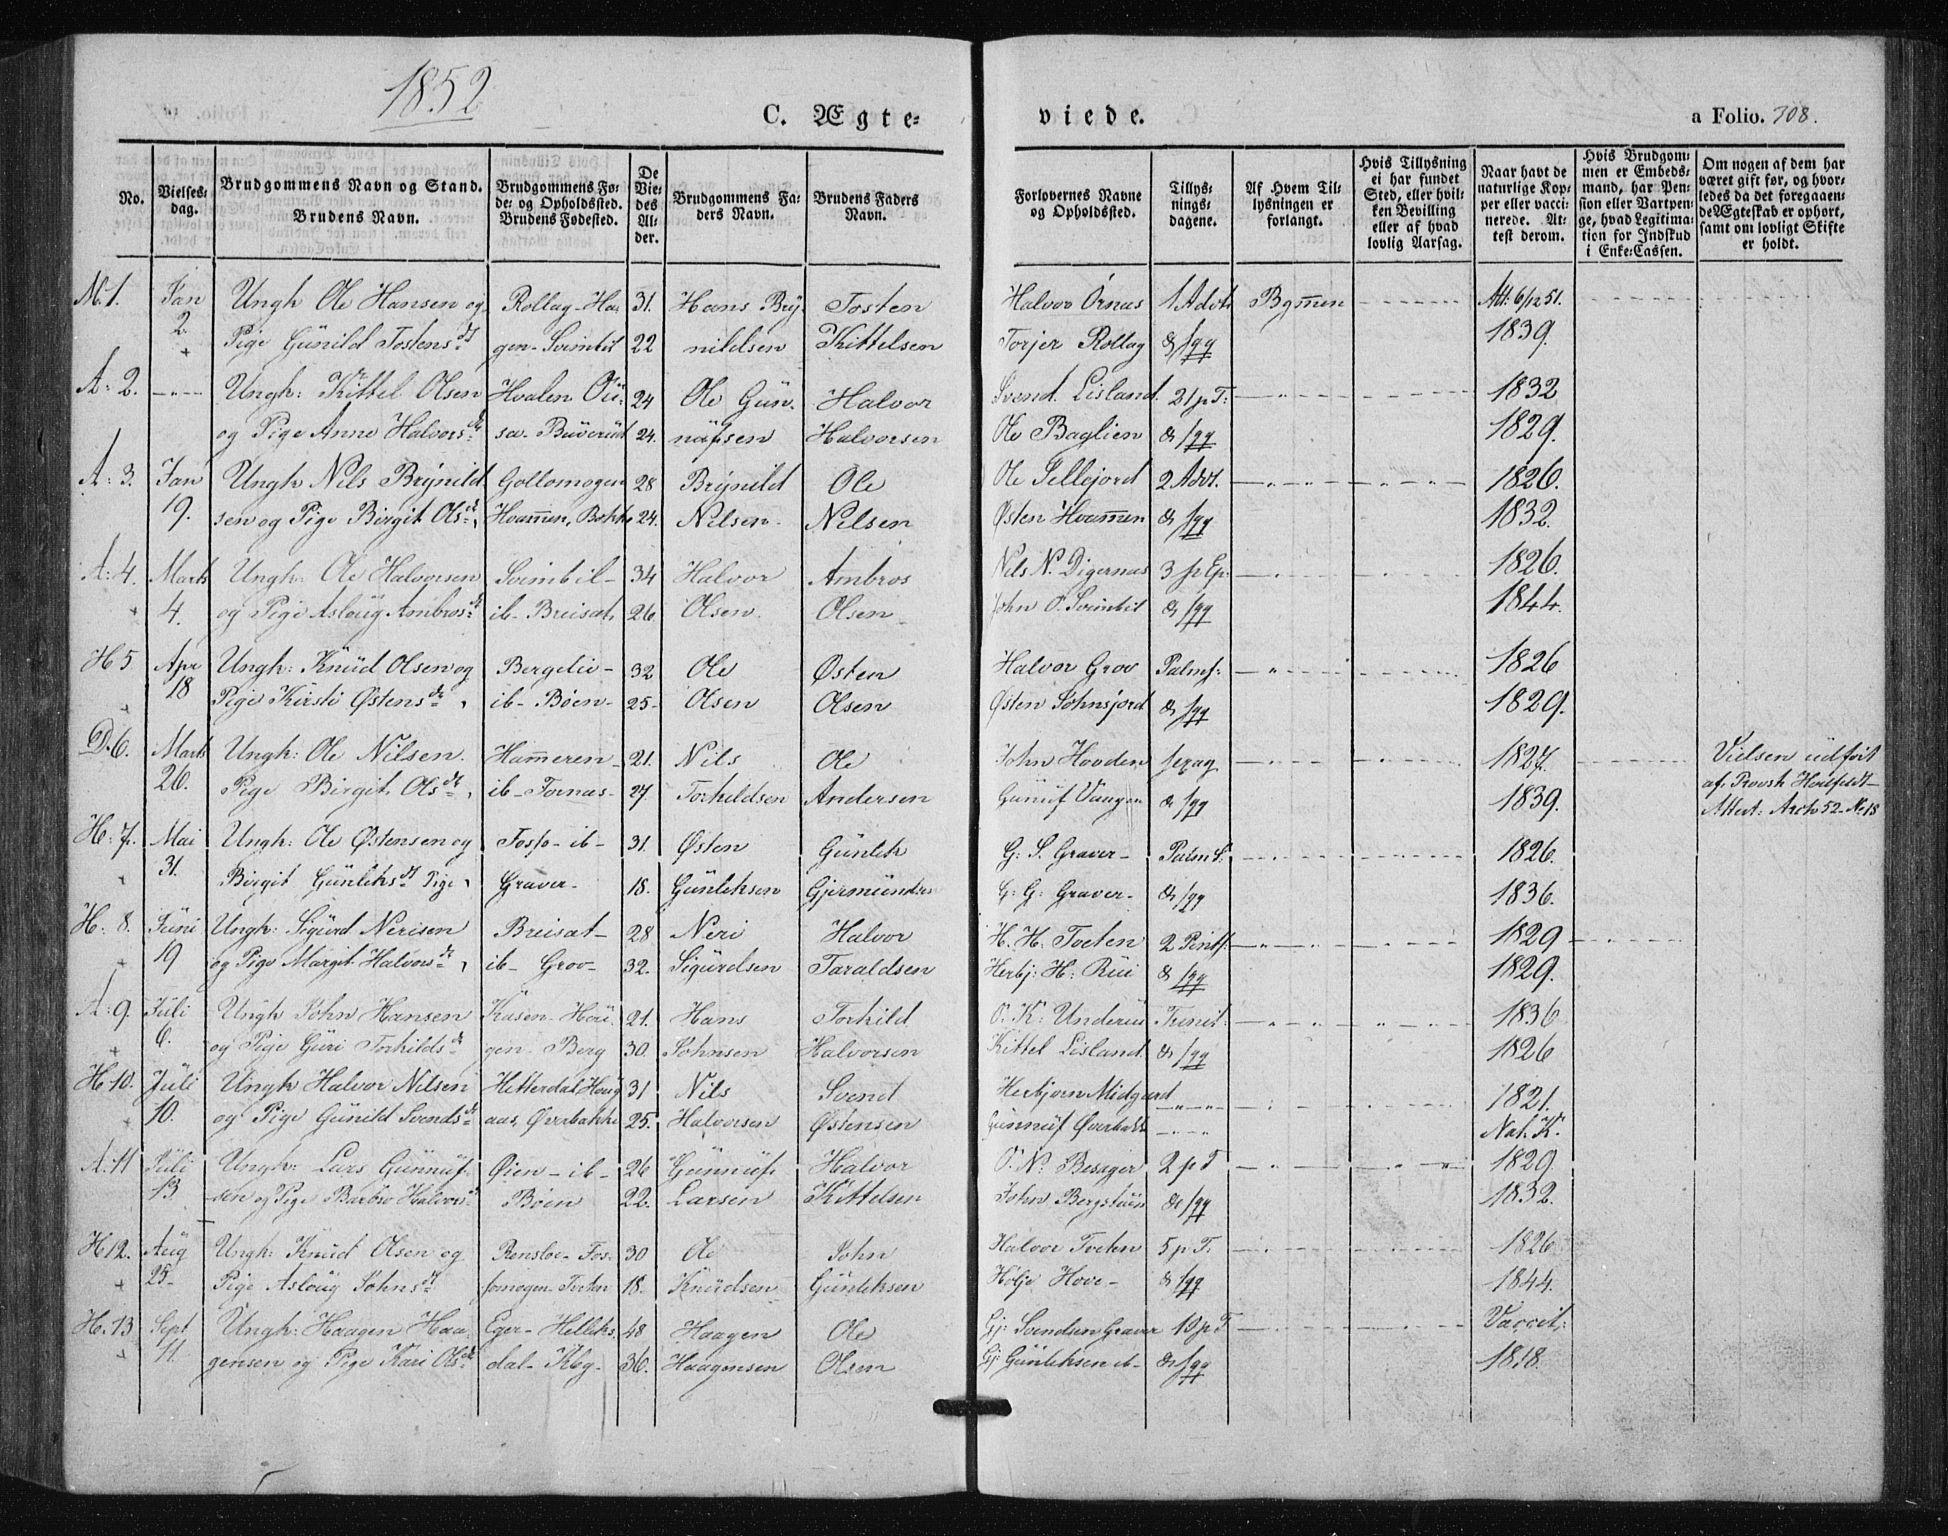 SAKO, Tinn kirkebøker, F/Fa/L0005: Parish register (official) no. I 5, 1844-1856, p. 308